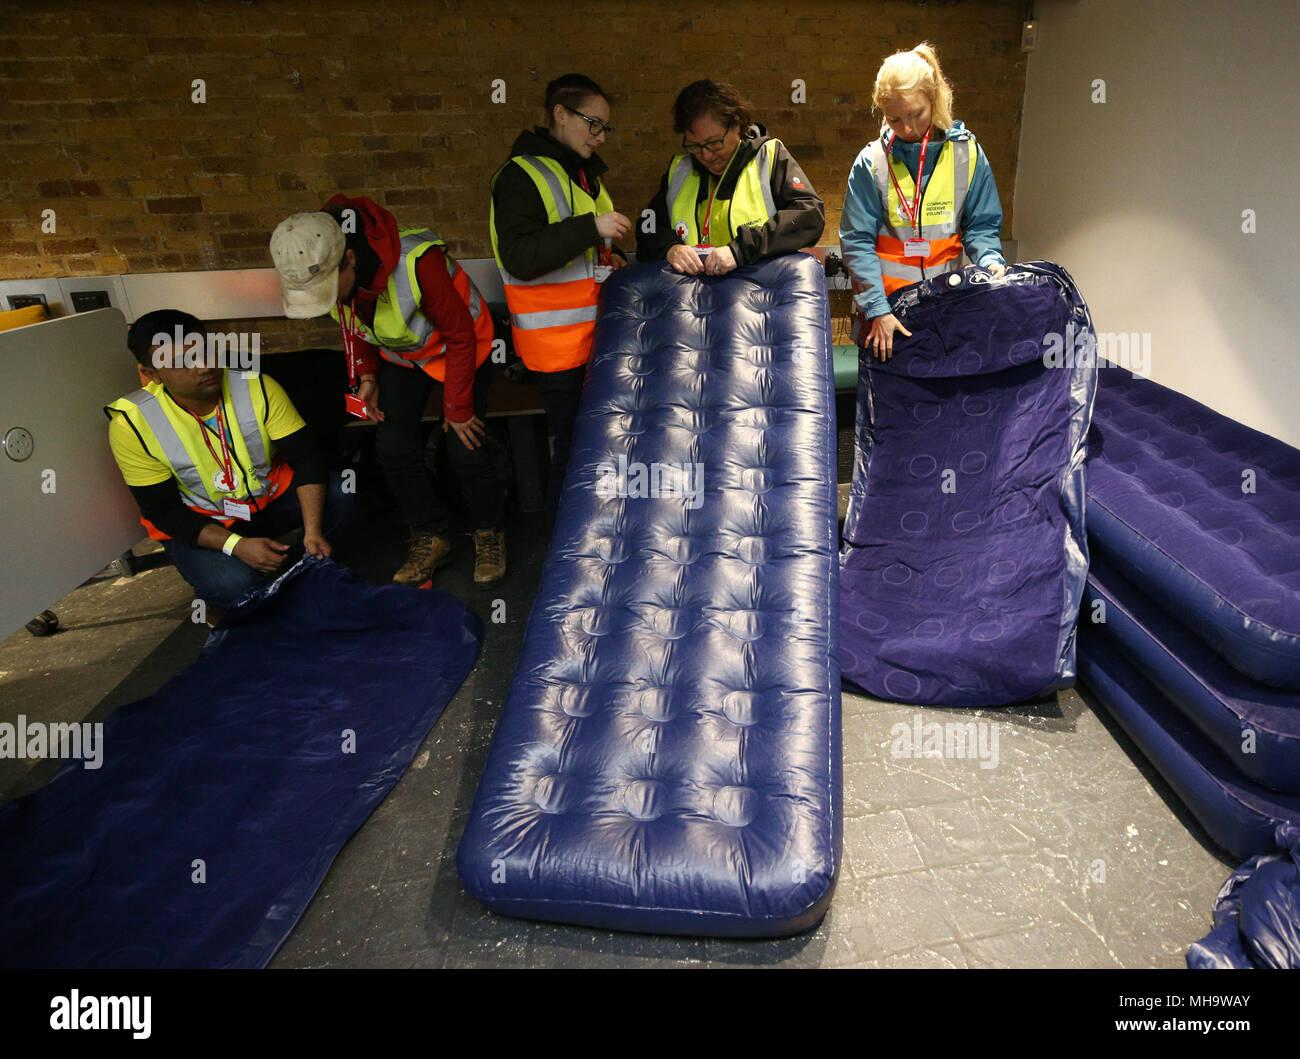 Volunteers Blowing Up Air Mattresses During An Emergency